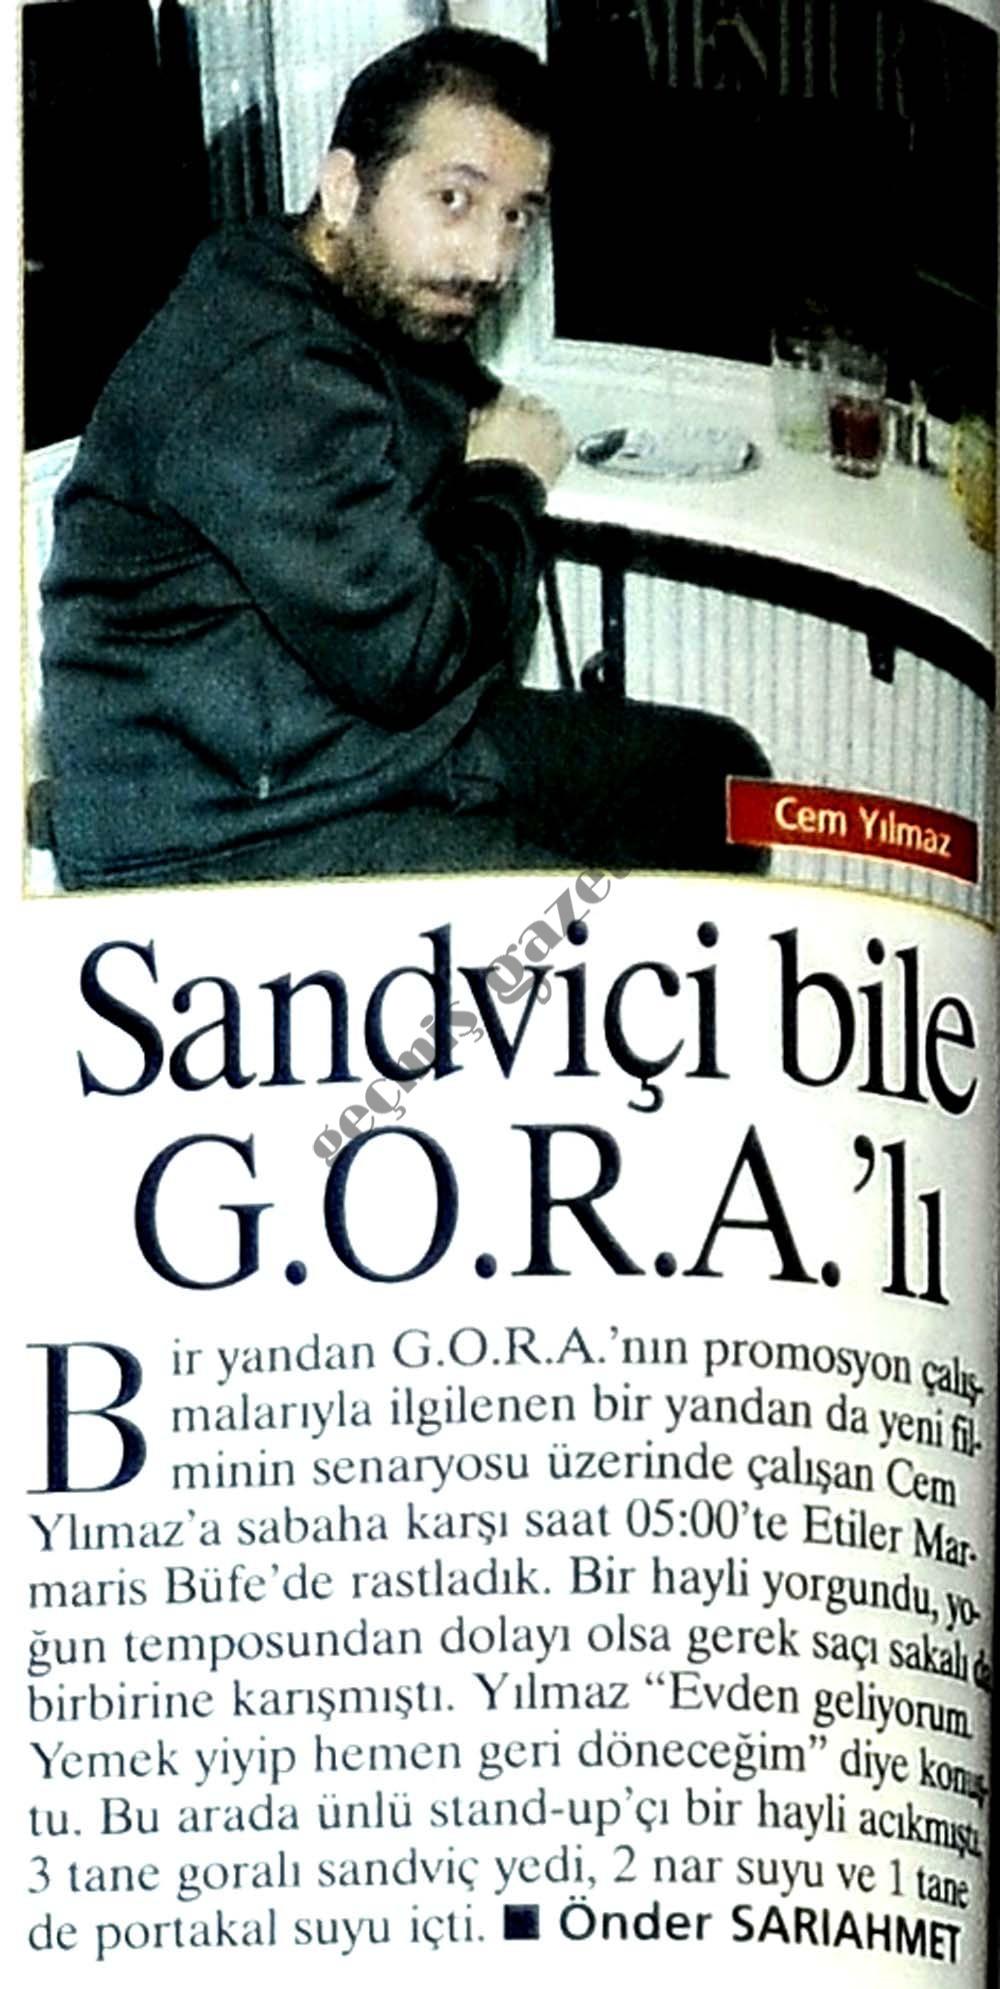 Sandviçi bile G.O.R.A.'lı